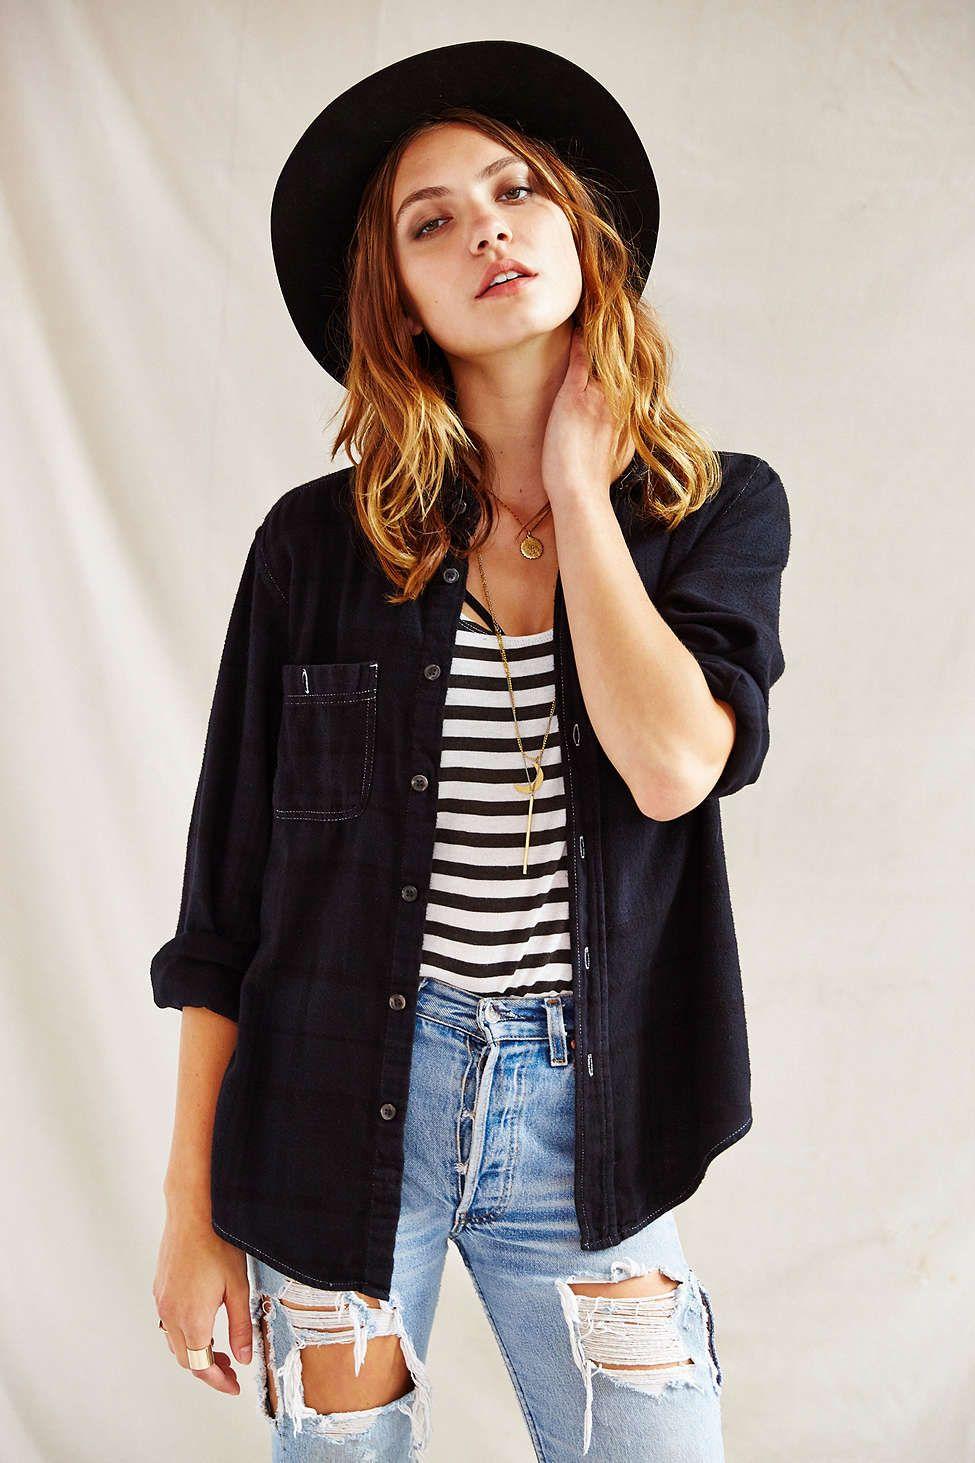 Flannel shirt outfit women  Urban Renewal Overdyed Flannel Shirt  Clothes  Pinterest  Urban